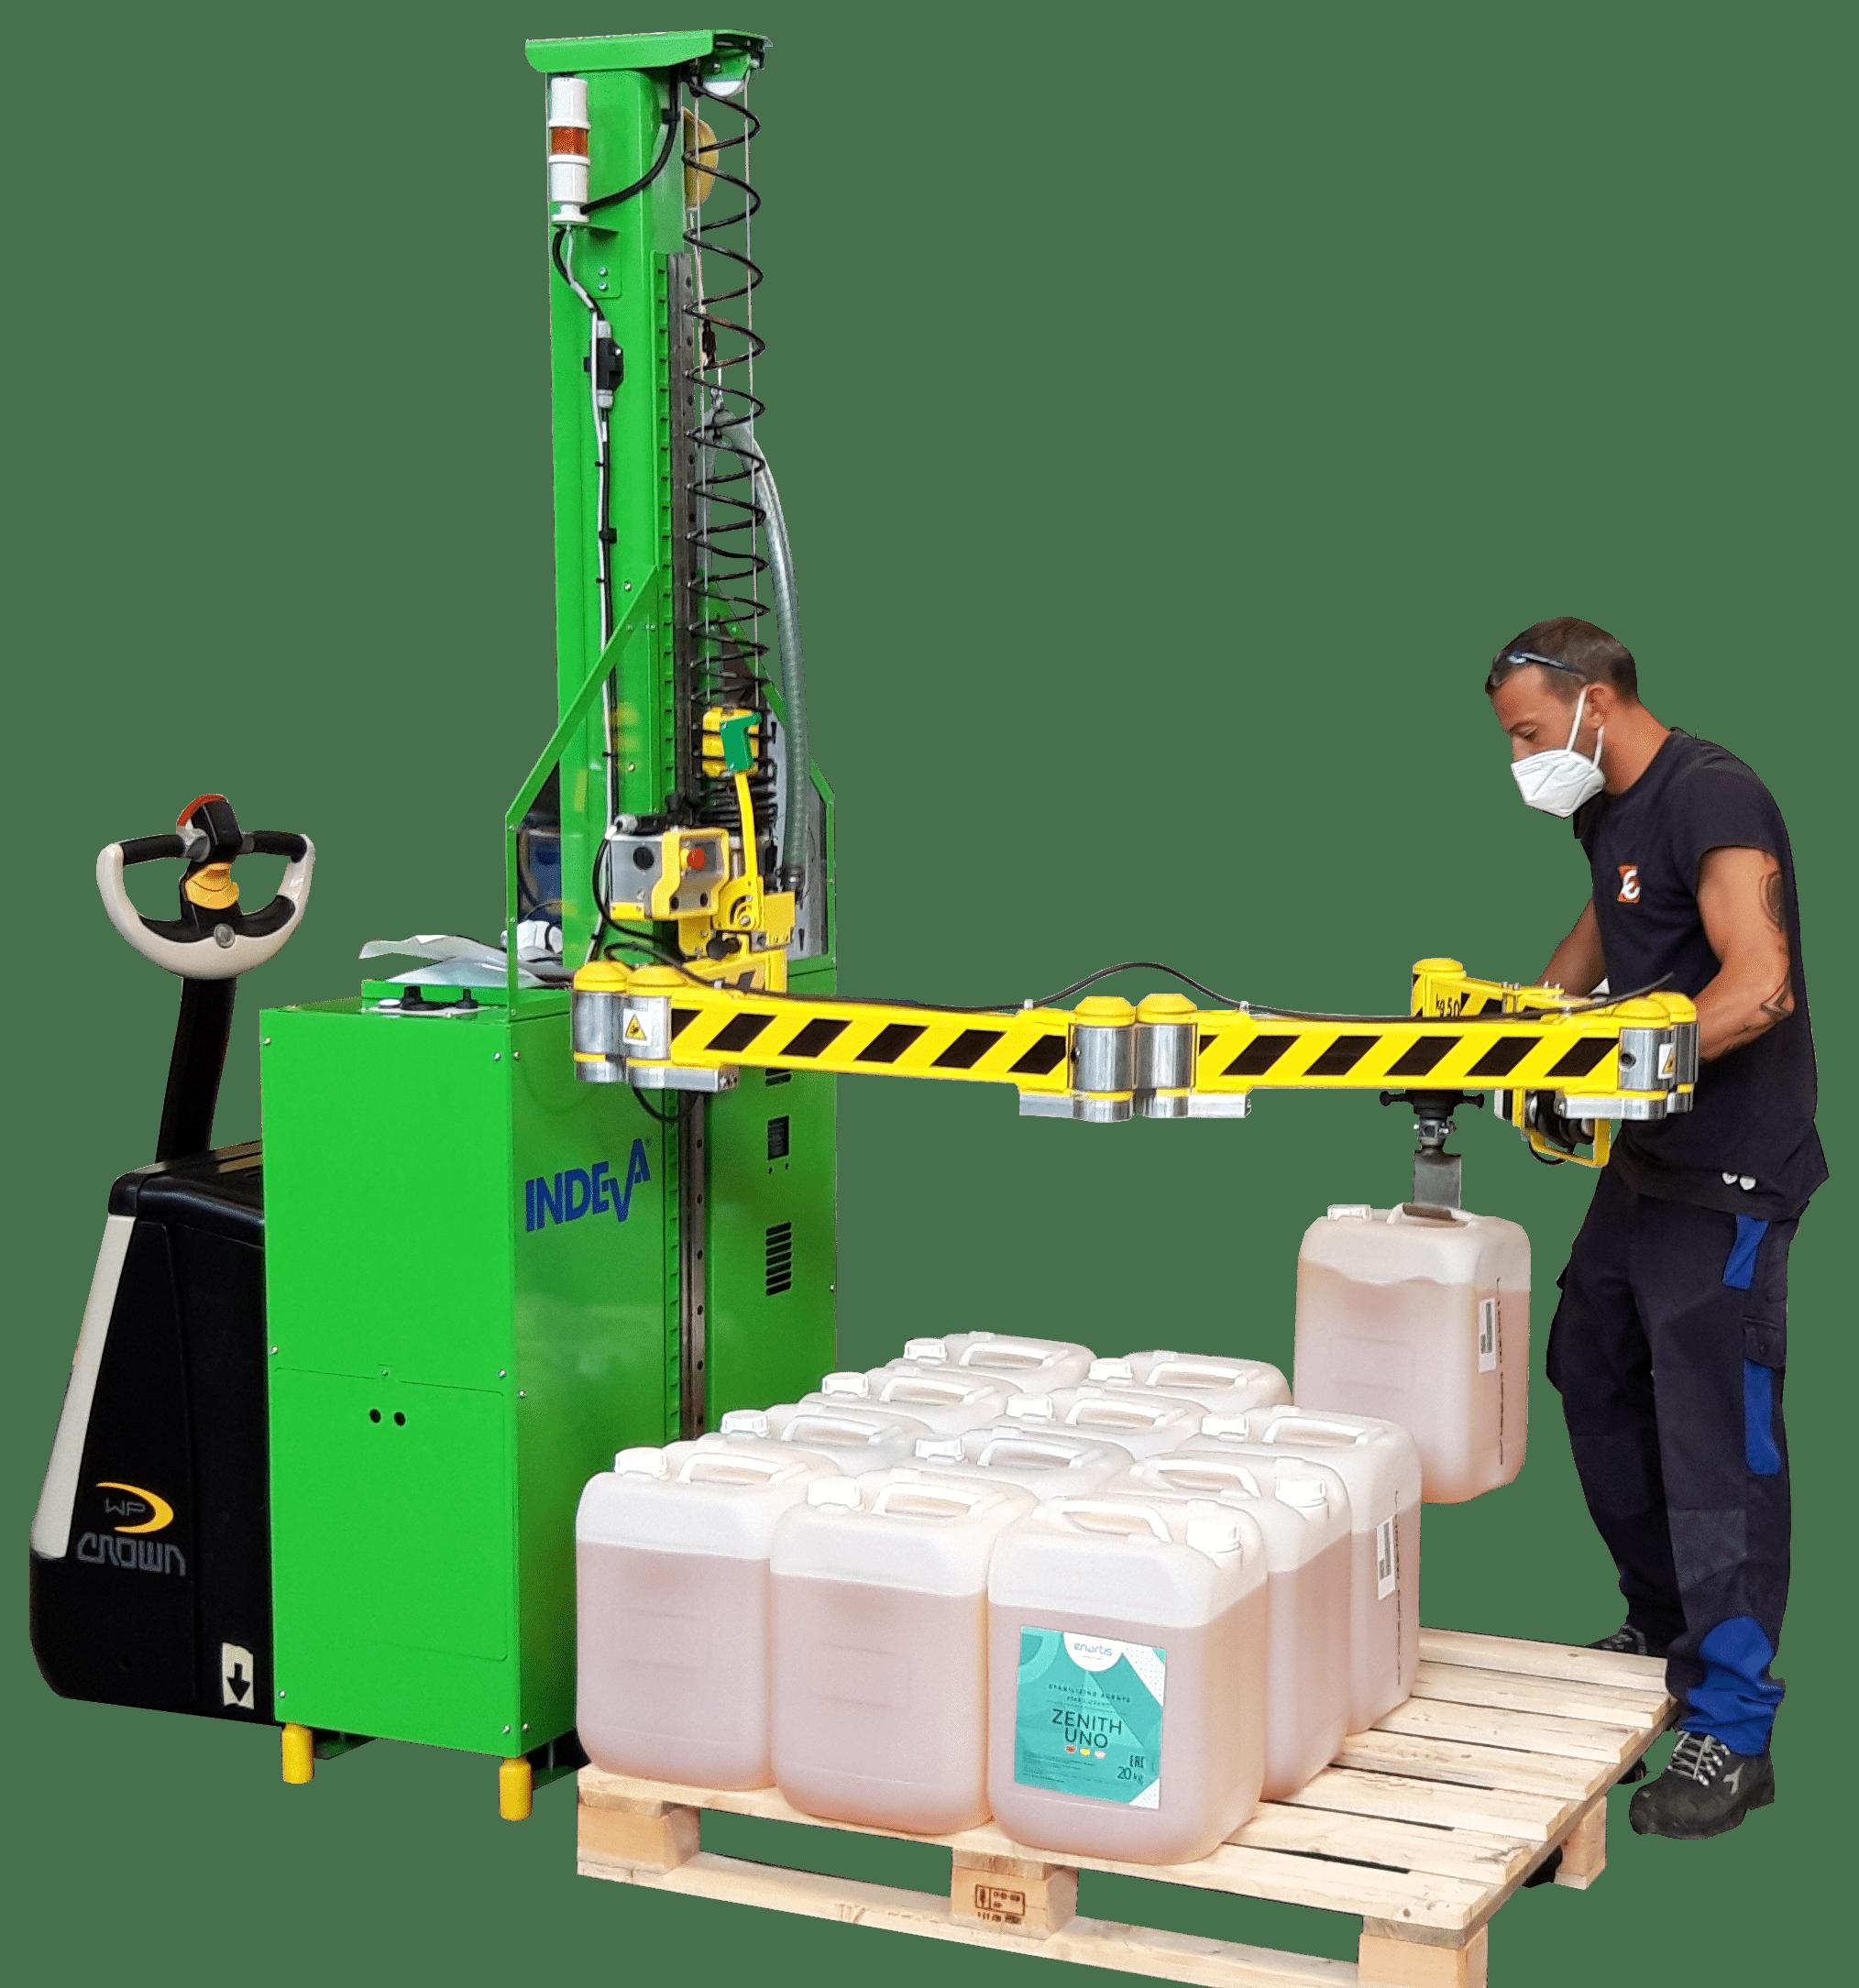 Warehouse material handling equipment